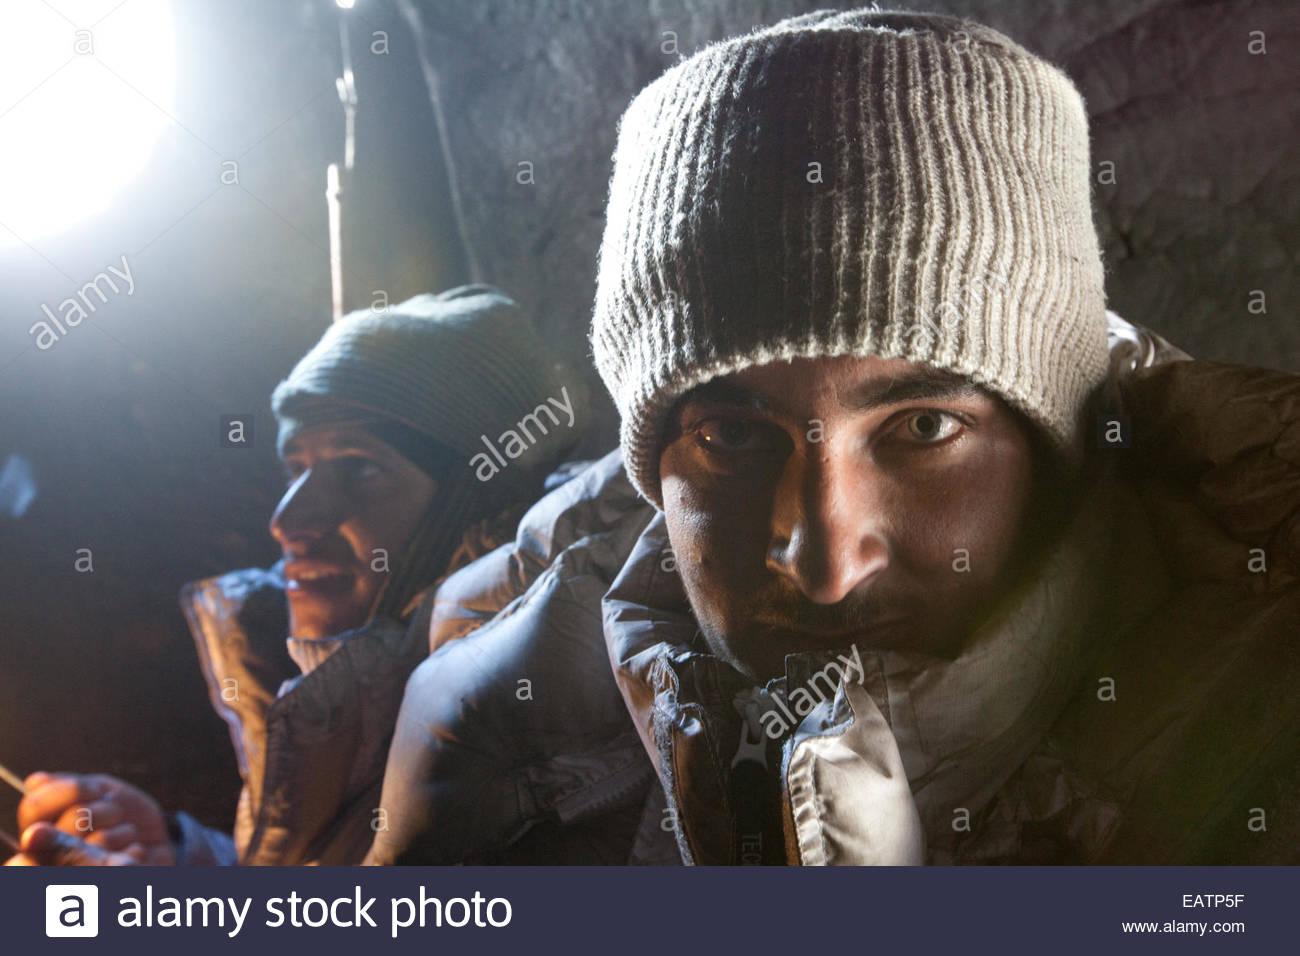 Pakistanische Soldaten in den indisch-pakistanischen Konflikt in ihrem Zelt. Stockbild